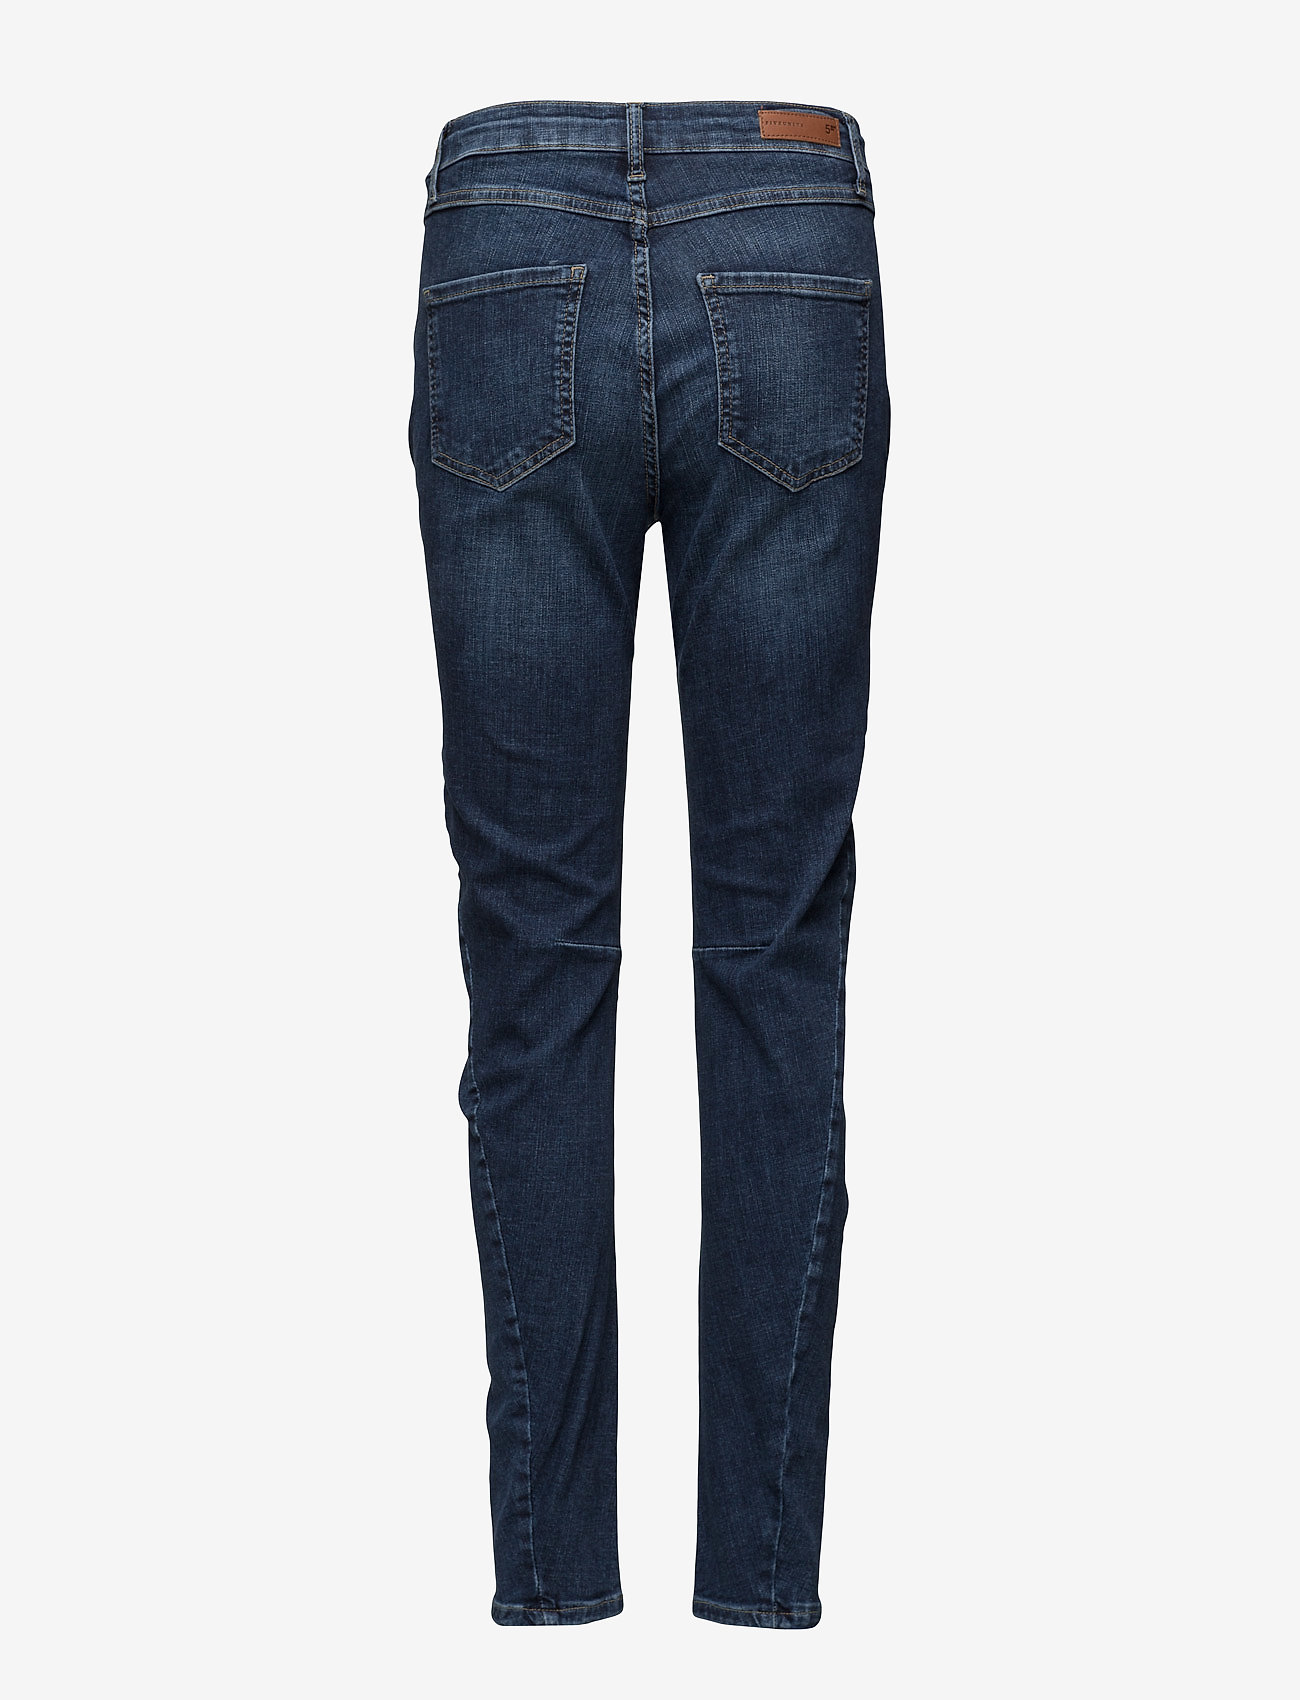 FIVEUNITS - Felicity 291 - slim jeans - faithful - 1